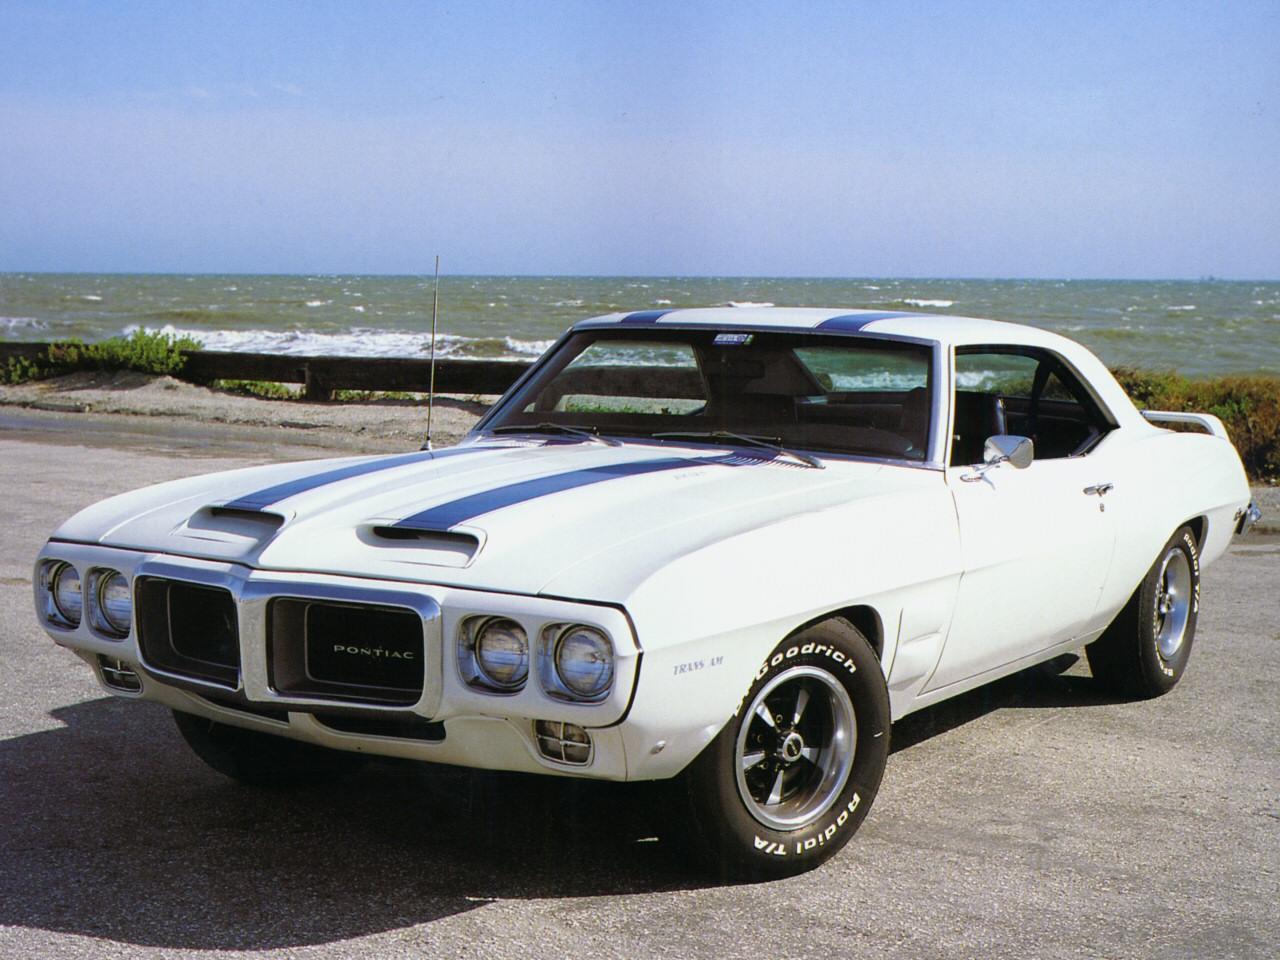 old-school muscle cars: 1969 Pontiac Firebird Trans Am